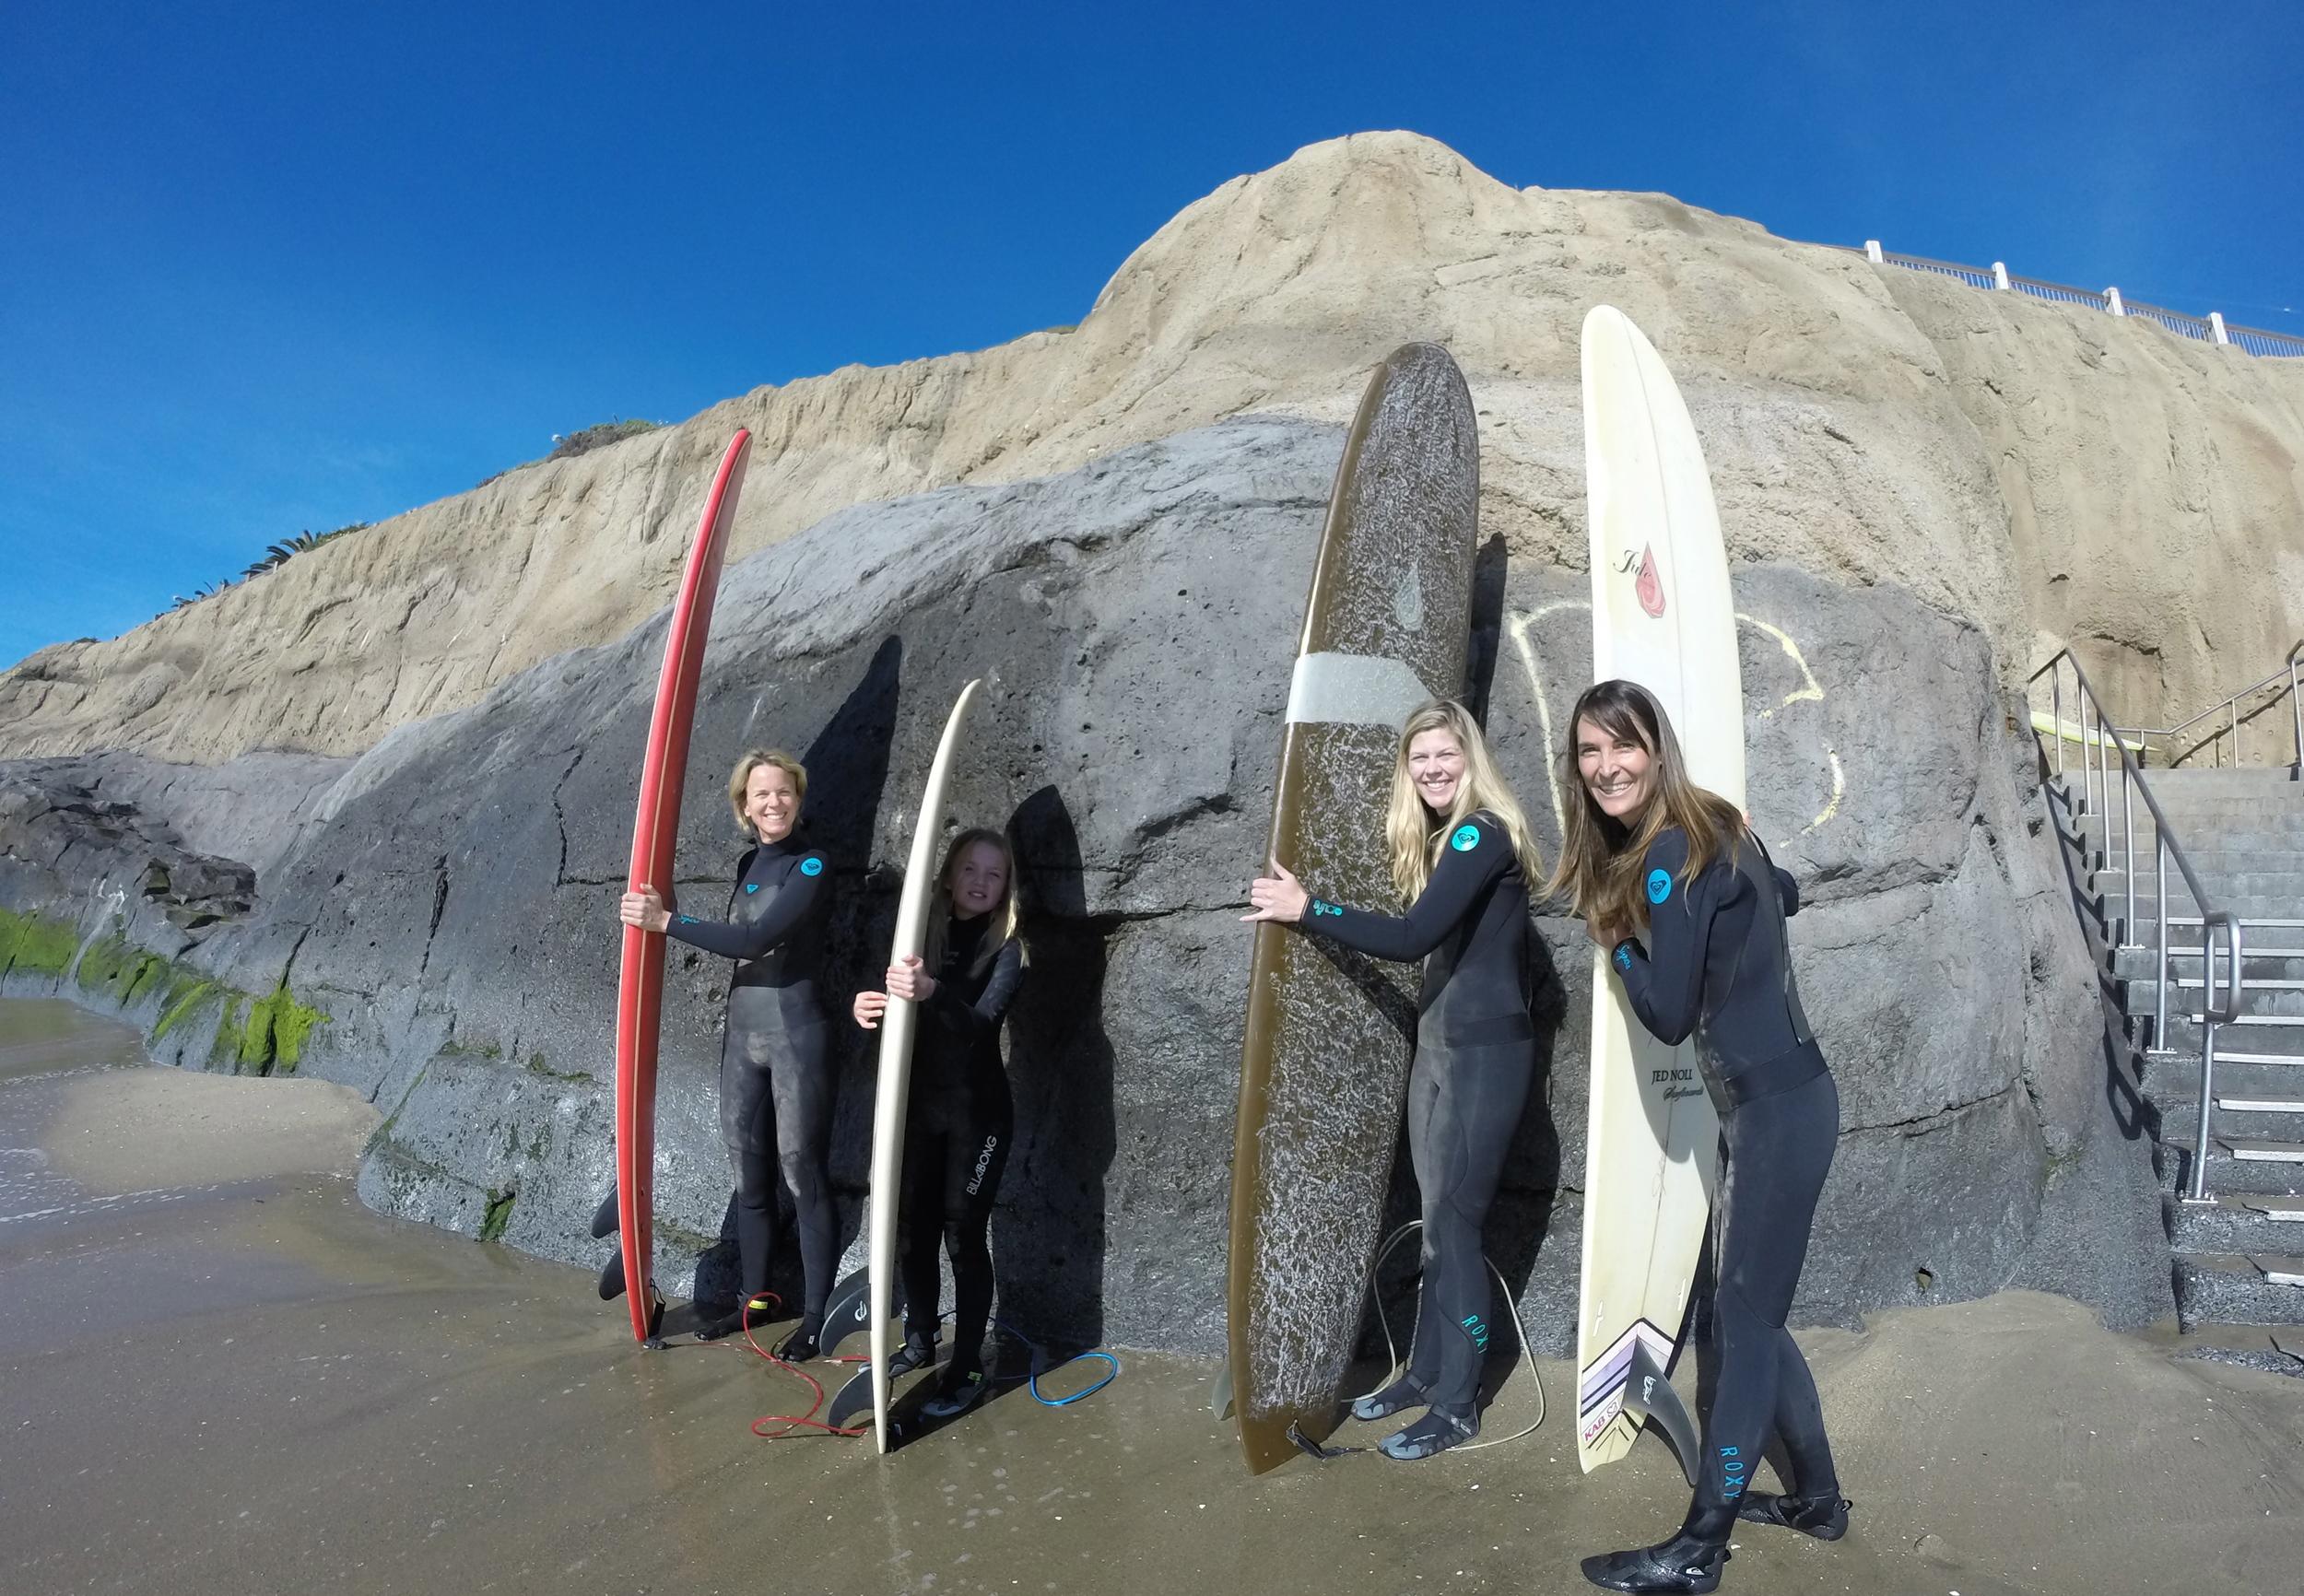 Kristin, Caity, Kristin, and Julie in Santa Cruz